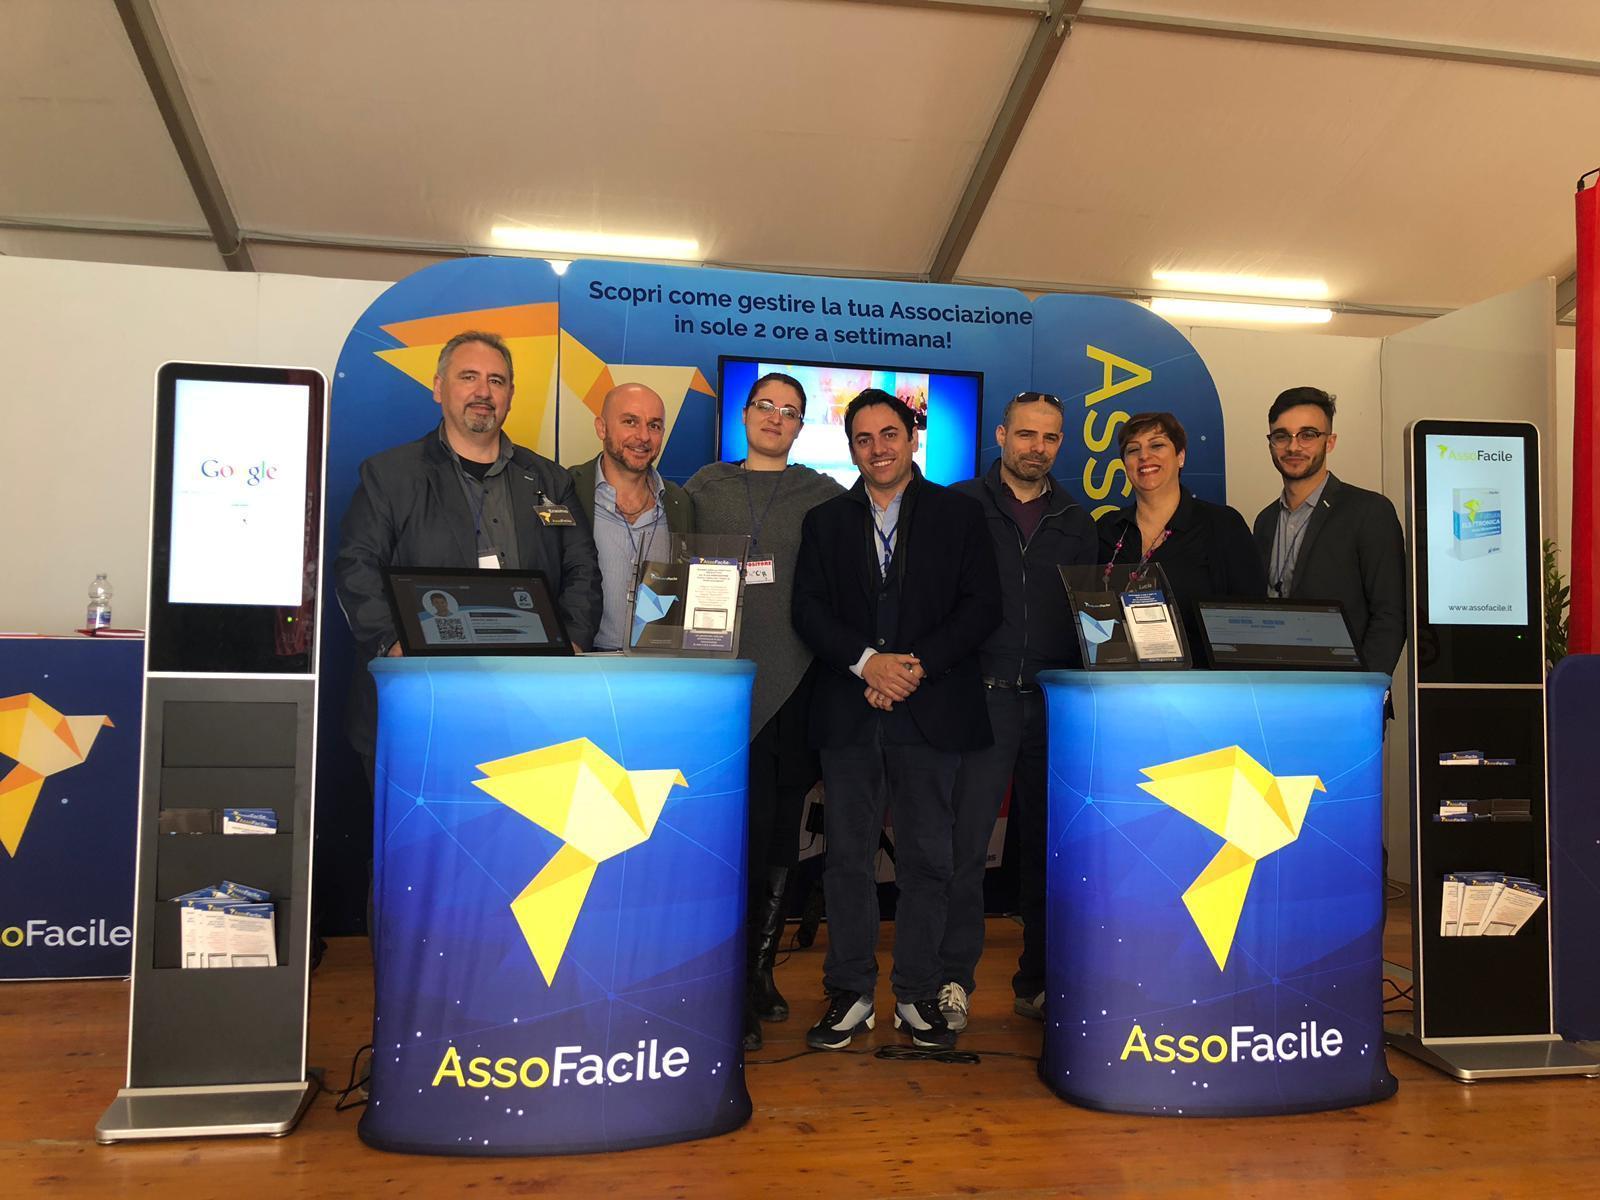 Recensioni AssoFacile: 1° Software gestionale per associazioni in Italia - appvizer